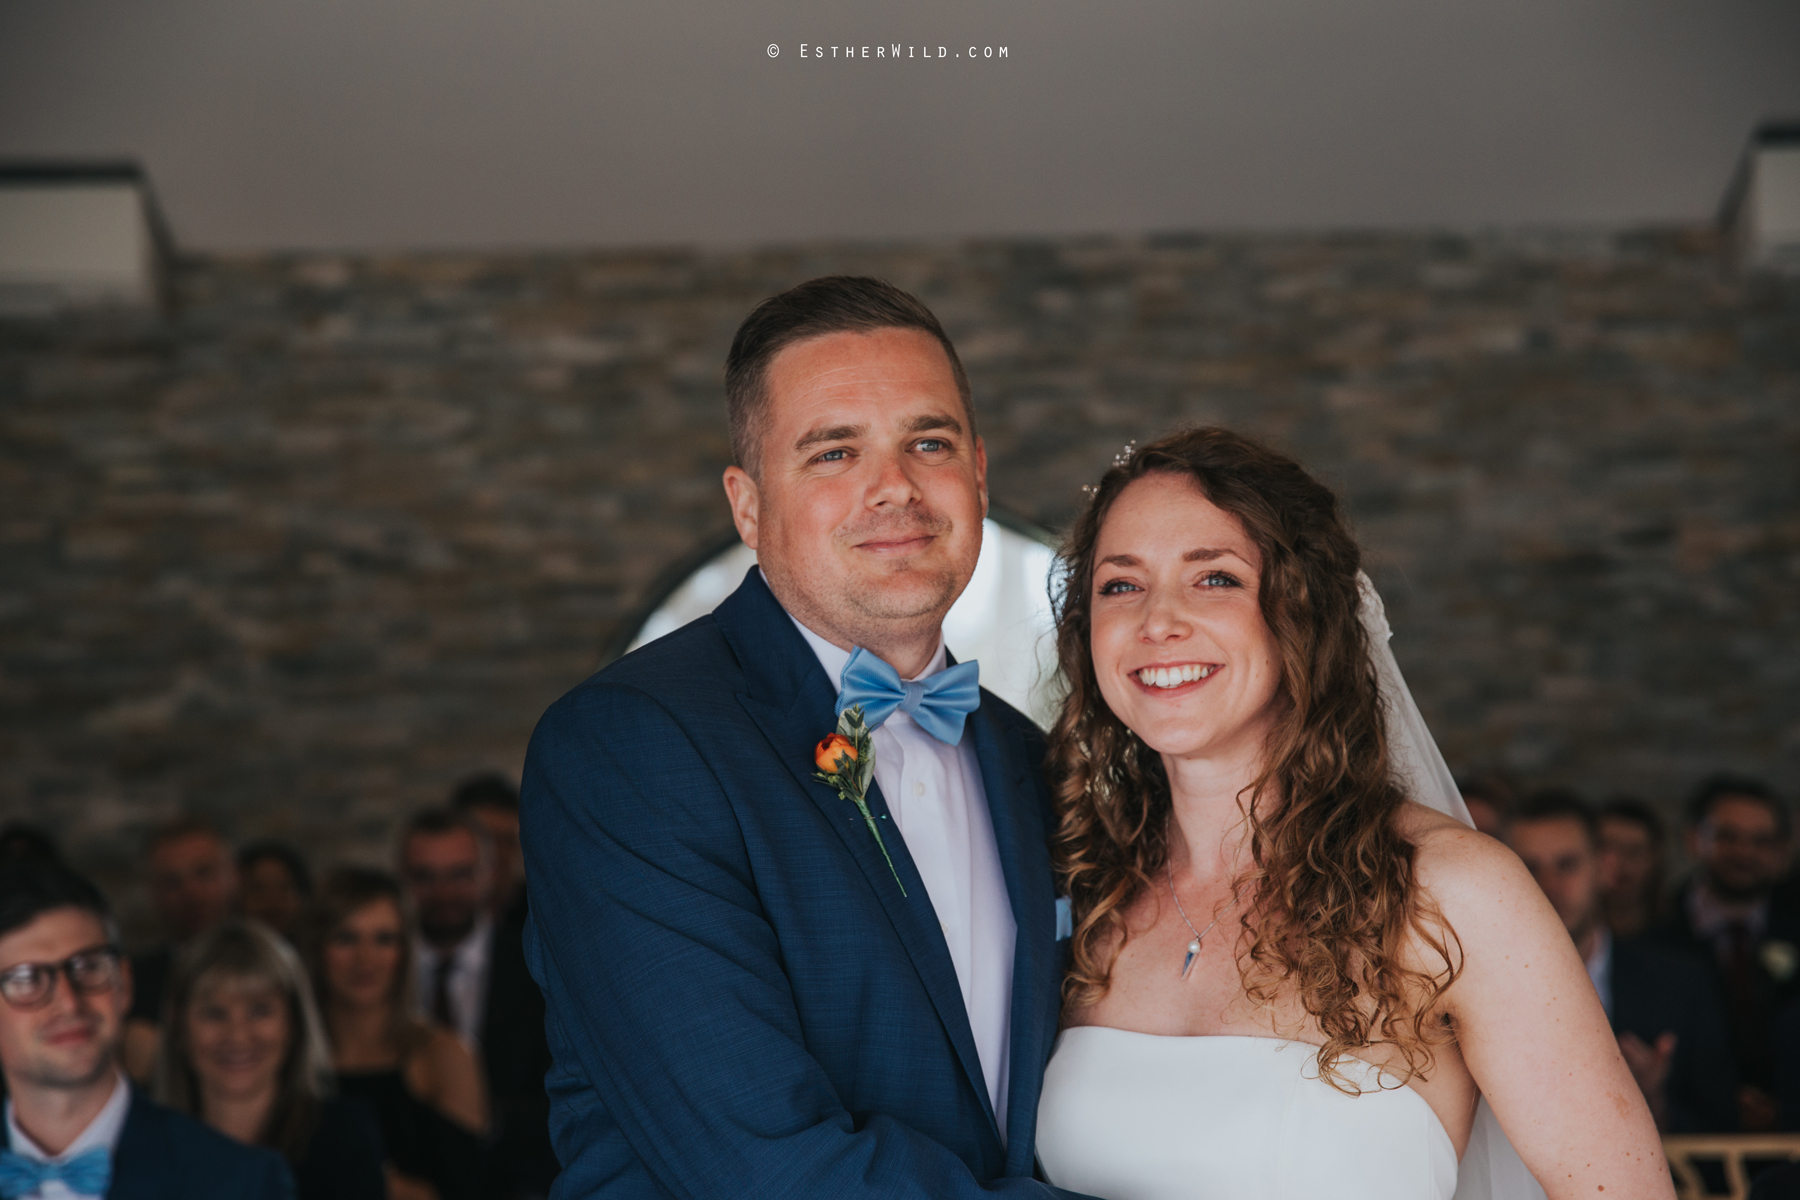 The_BoatHouse_Wedding_Venue_Ormesby_Norfolk_Broads_Boat_Wedding_Photography_Esther_Wild_Photographer_IMG_1166.jpg